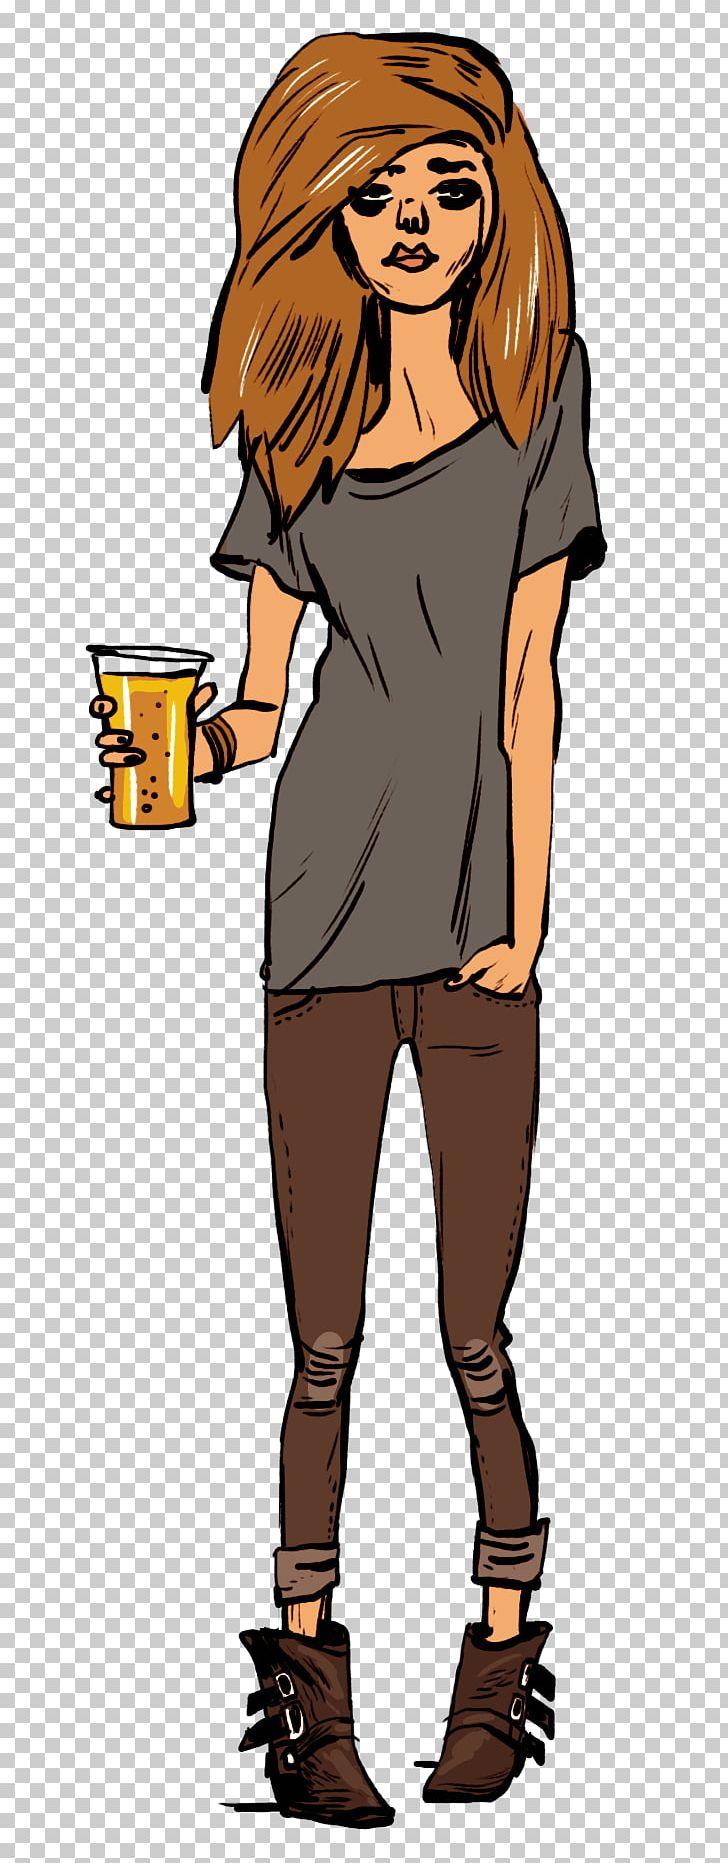 Human Behavior Shoulder Shoe Cartoon PNG, Clipart, Anheuserbusch, Art, Beer, Behavior, Brown Hair Free PNG Download